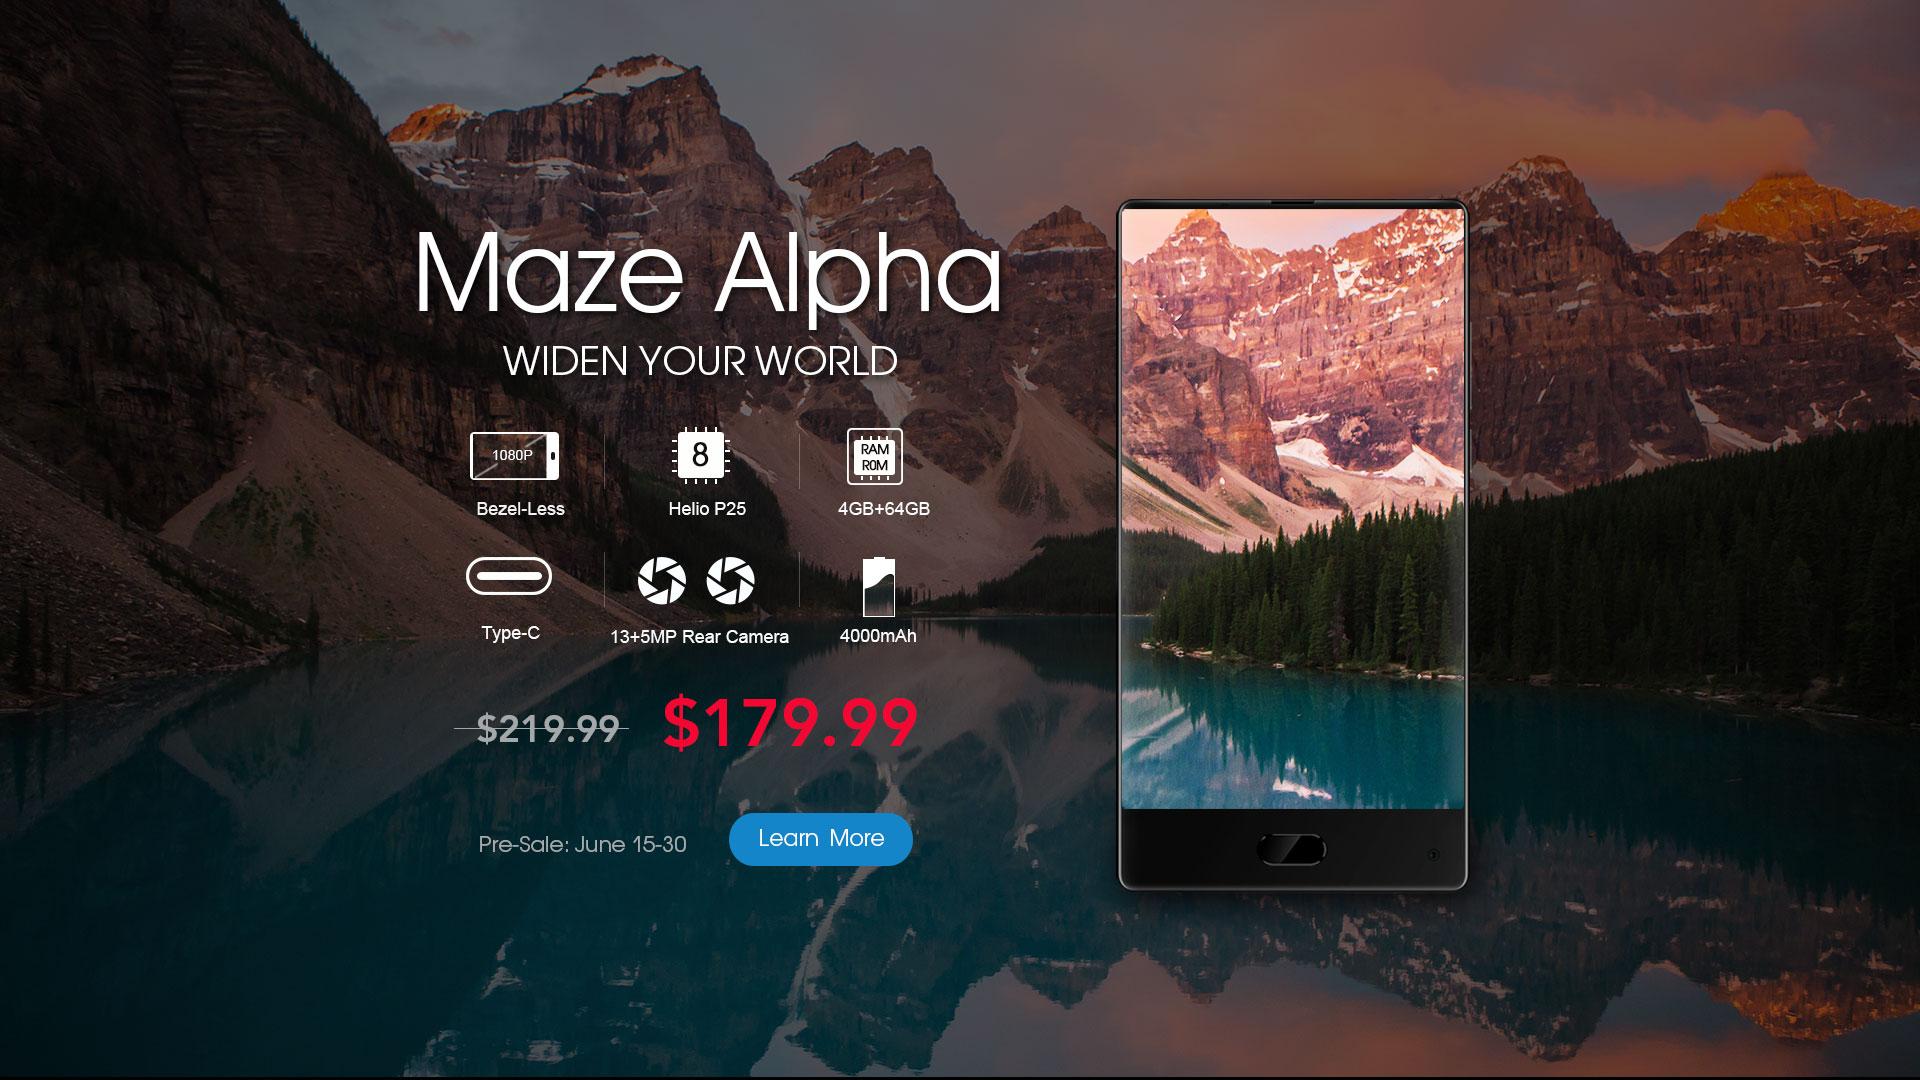 Maze Alpha prezzo